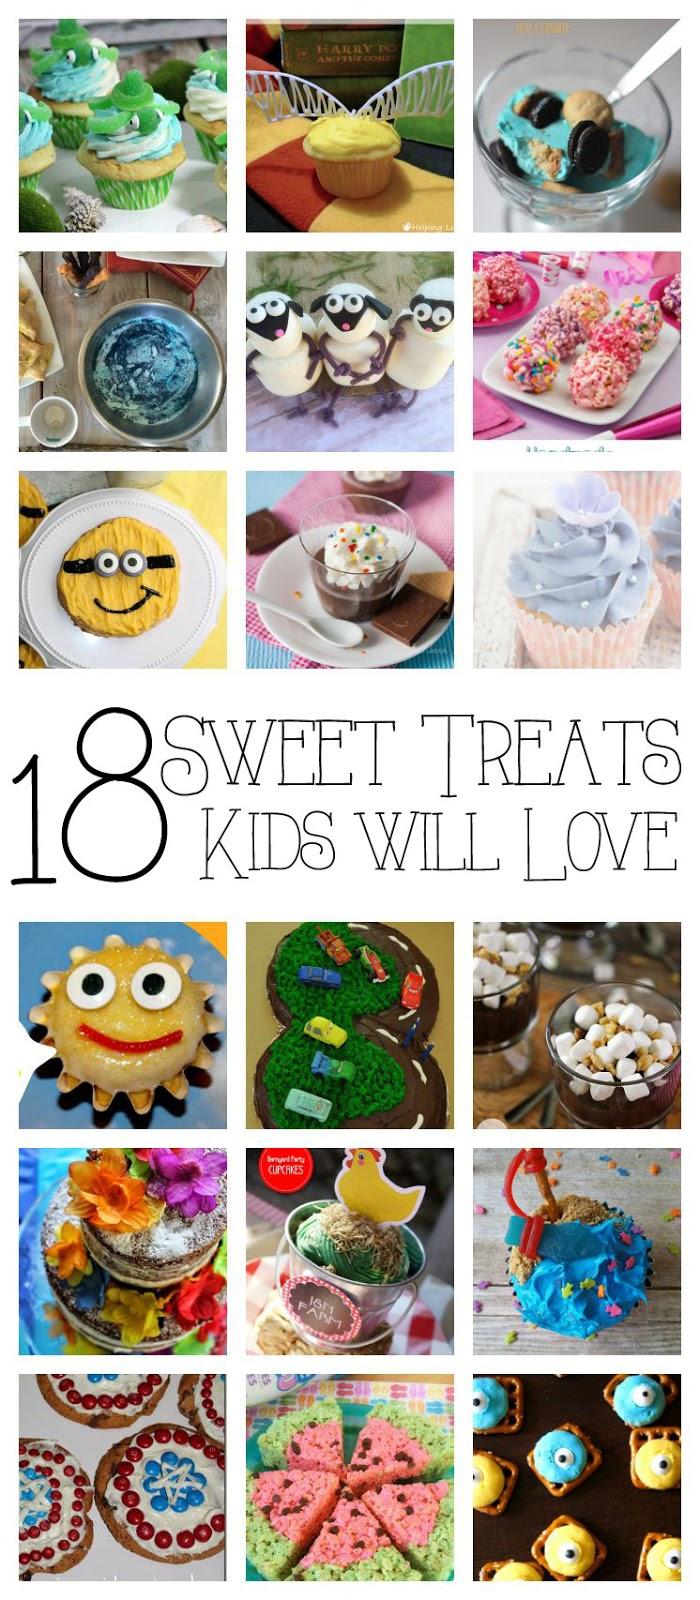 Sweet treats for kids. Fun dessert recipes